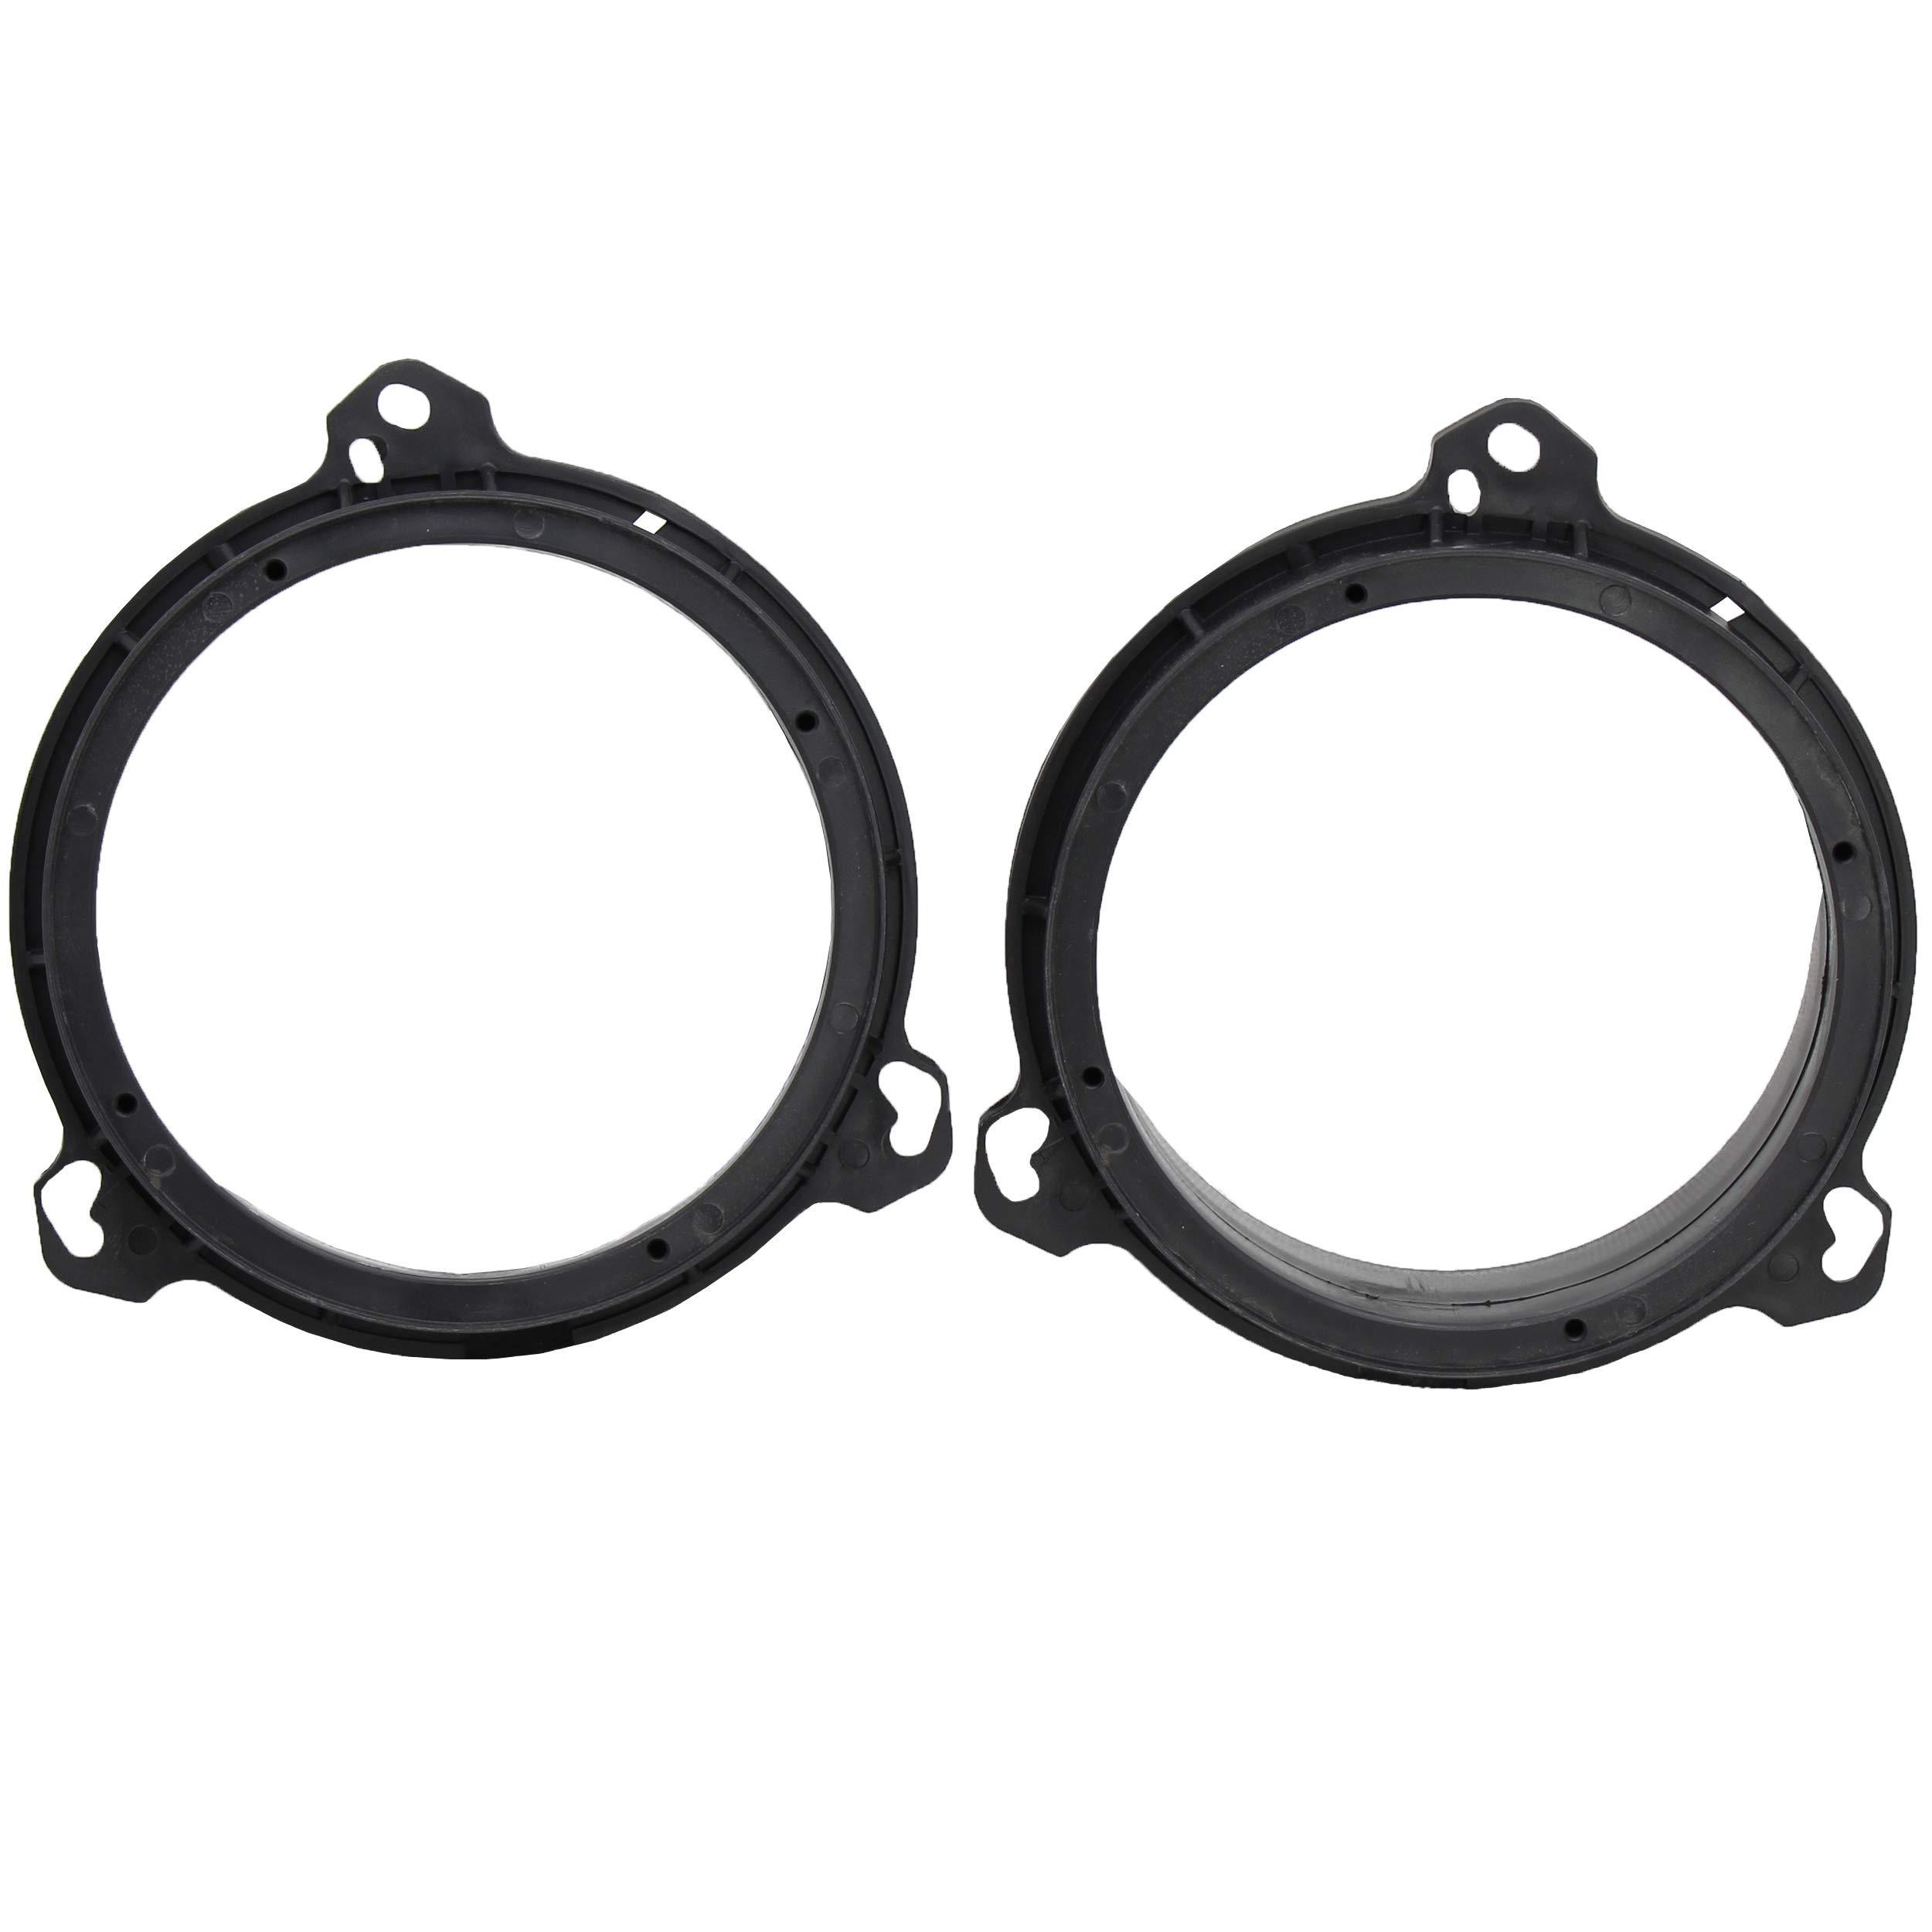 6.5 inch Speaker Adapter Spacers Bracket+Speaker Wire Harness for Nissan 00-2019